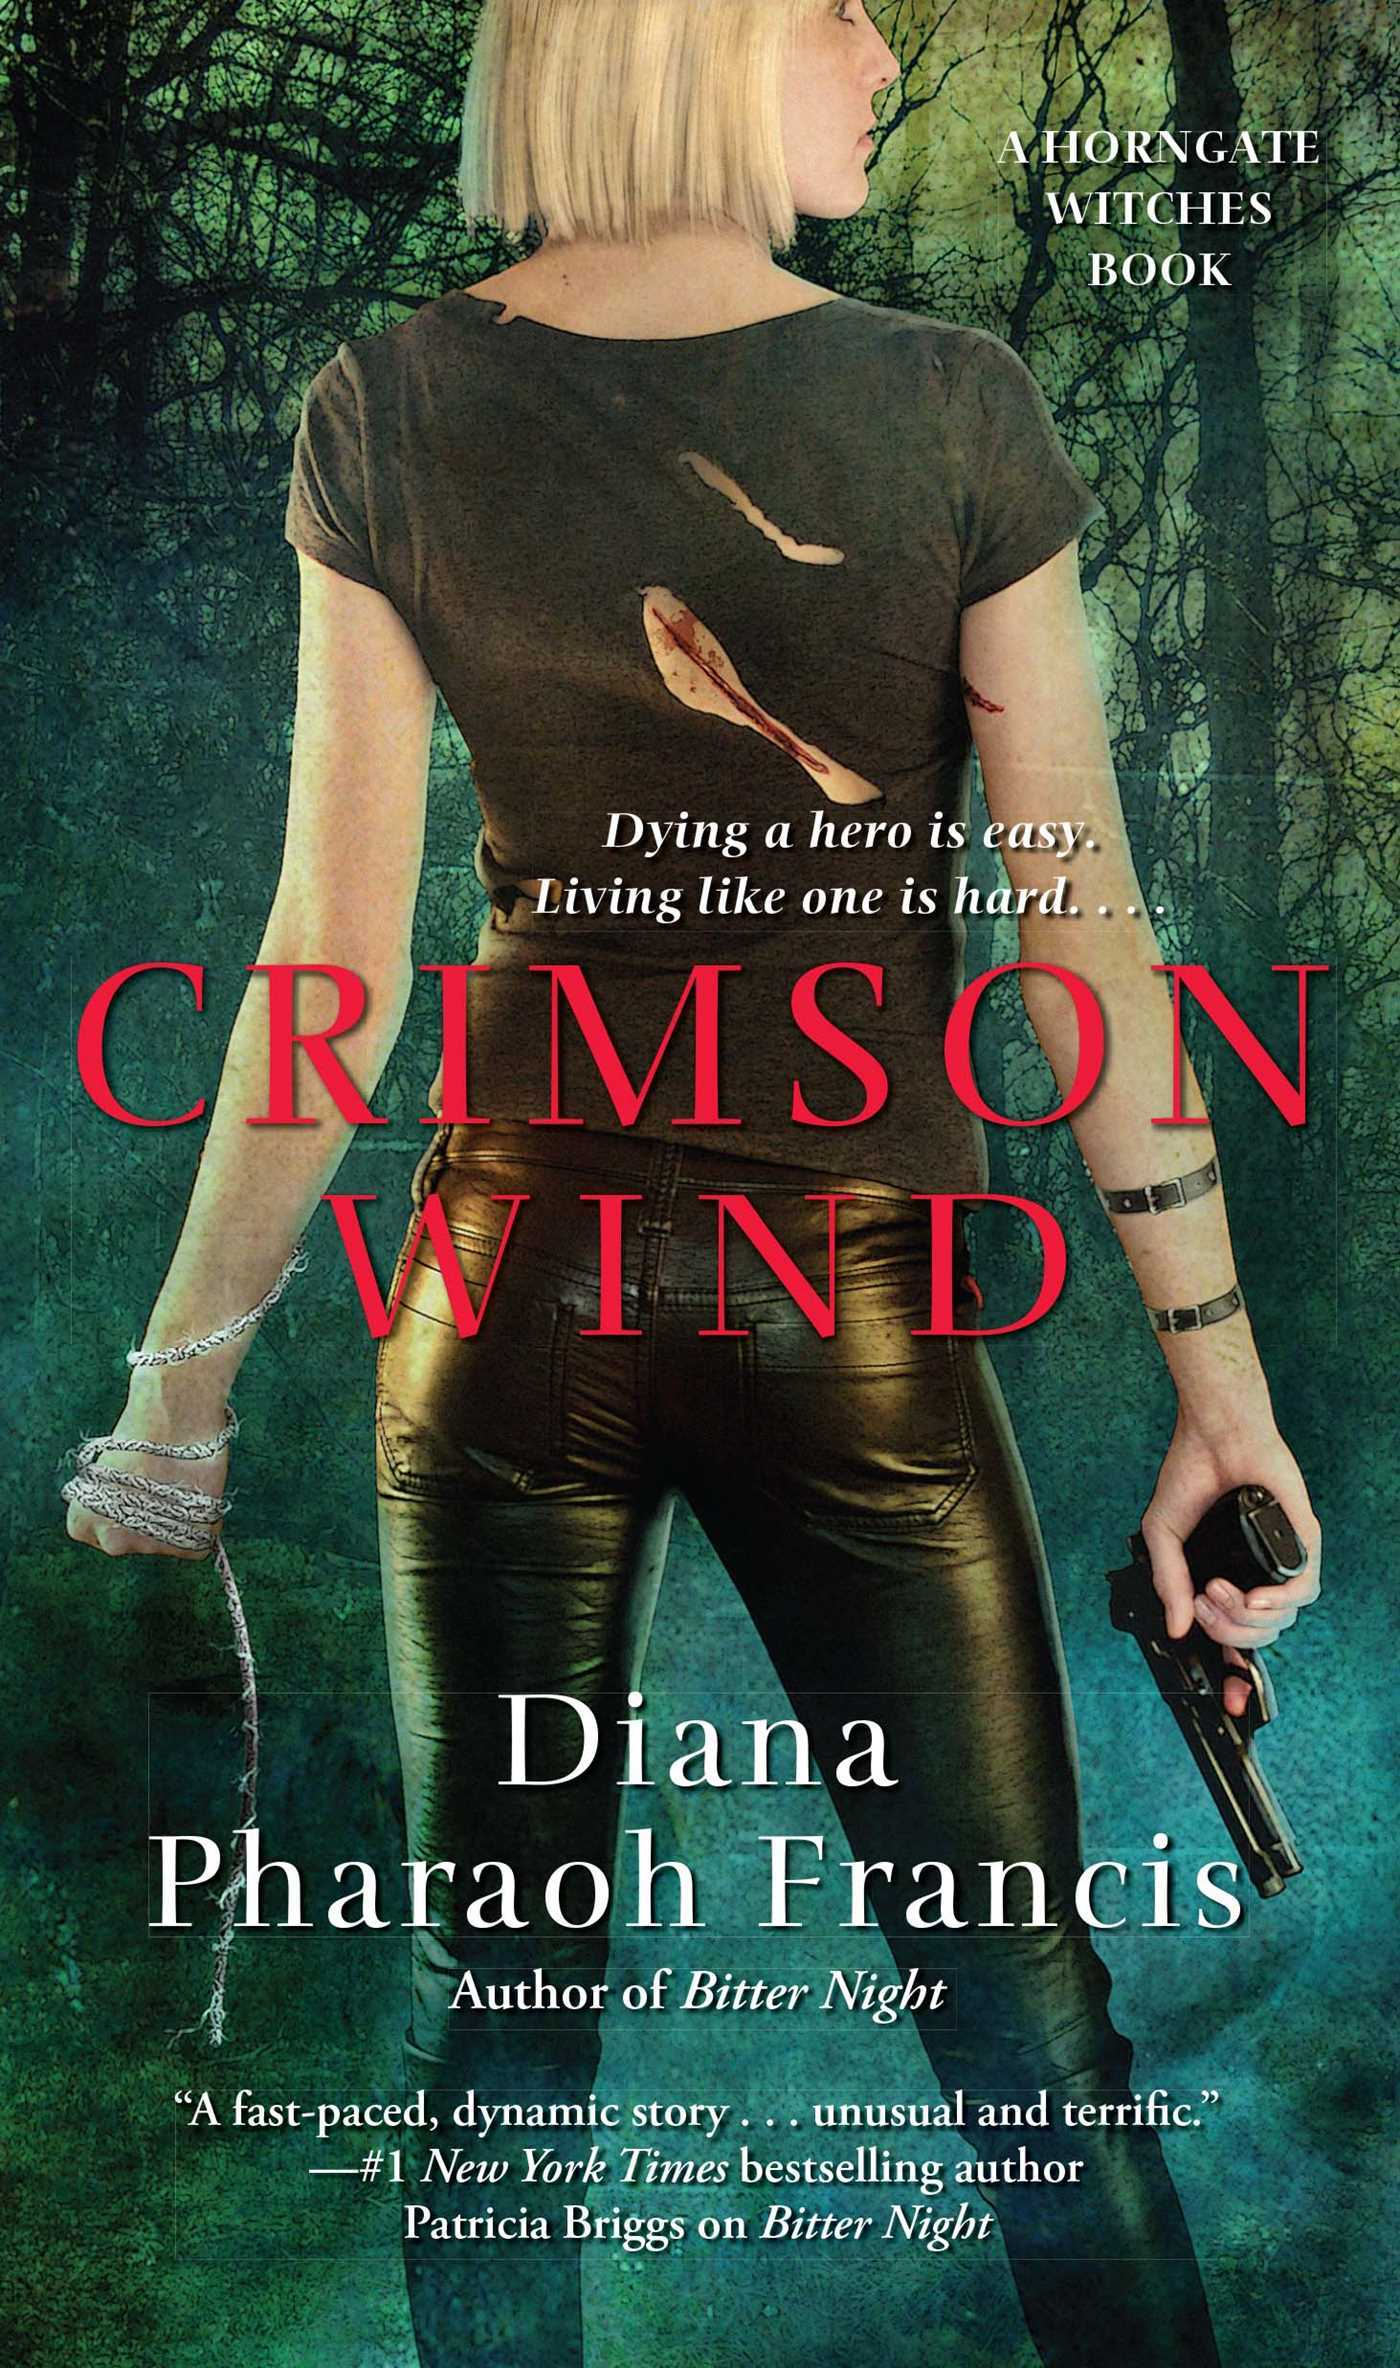 Crimson Wind Diana Pharaoh Francis